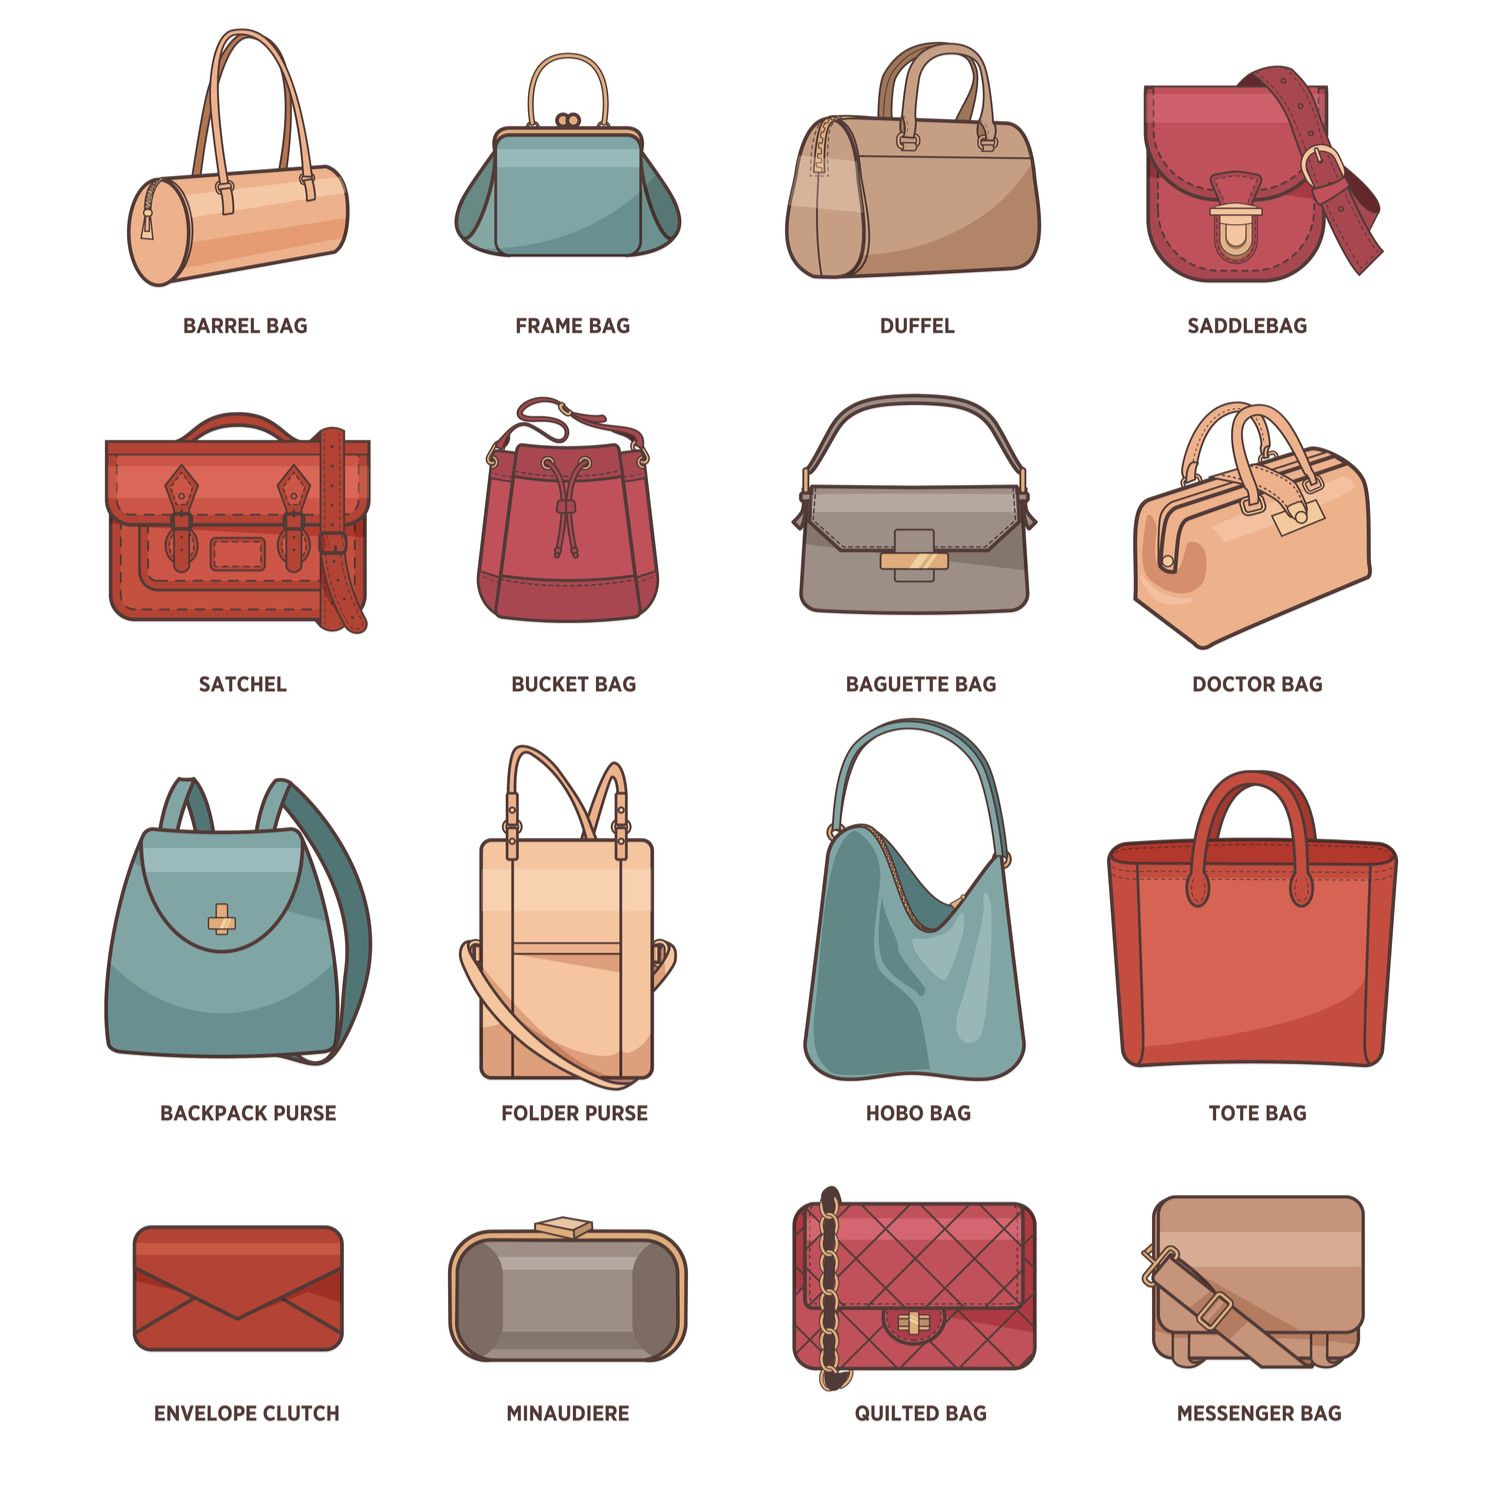 25 Types Of Handbags Do You Know Them All Types Of Handbags Purses And Handbags Fashion Bags